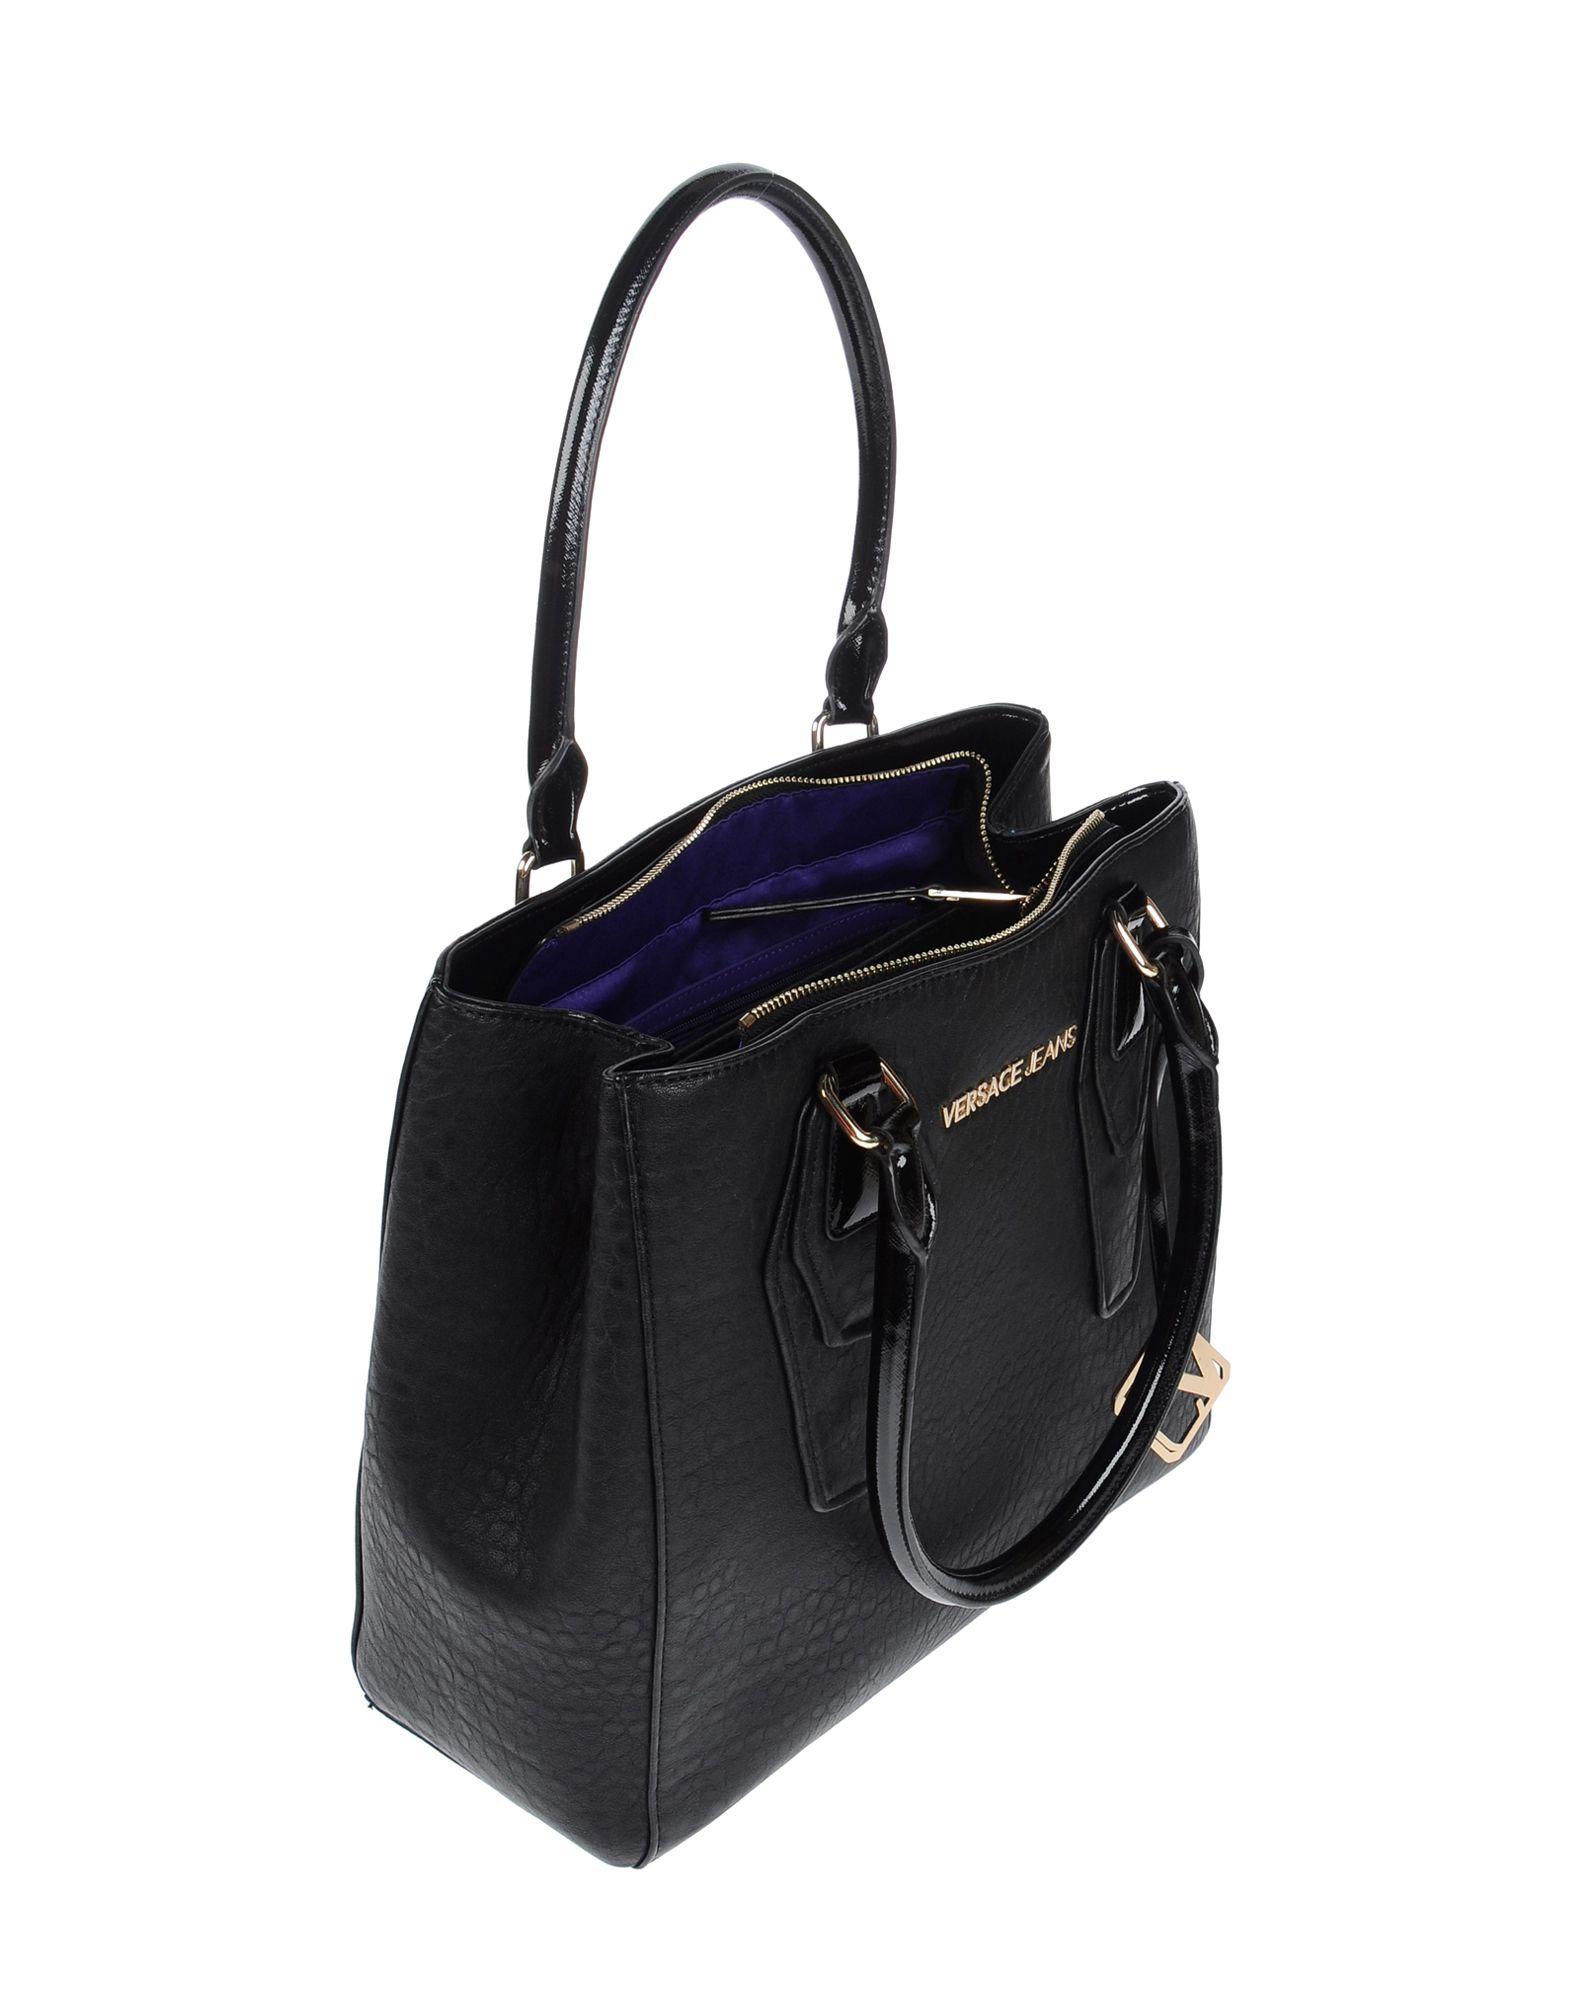 cccefb4eb9 Lyst - Versace Jeans Handbag in Black